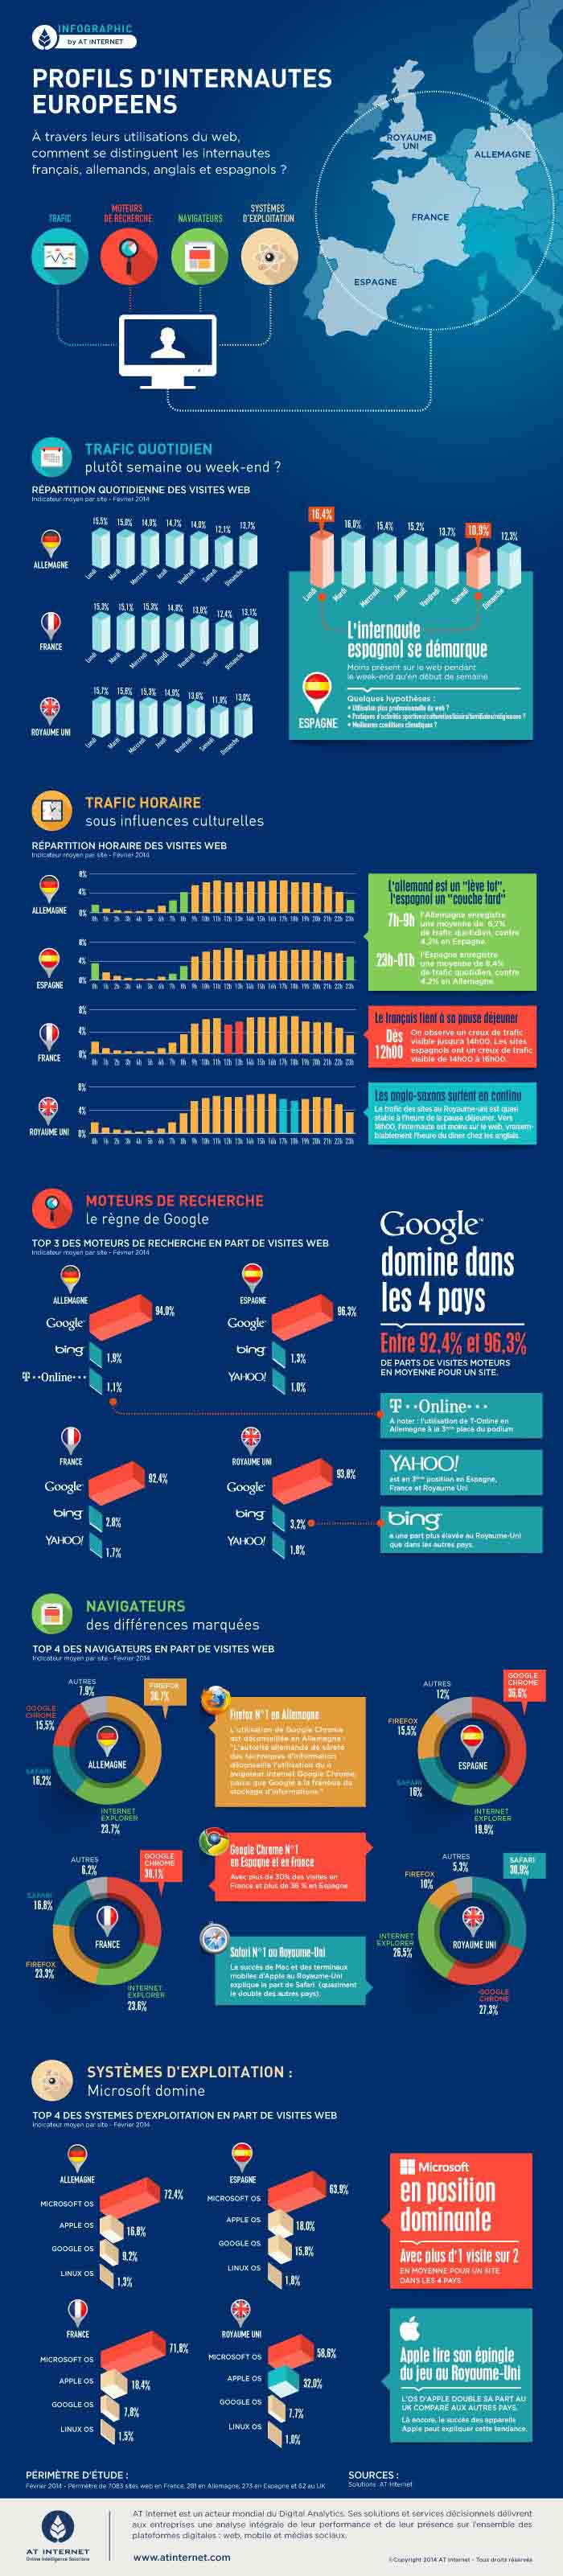 Infographie Euro profiles